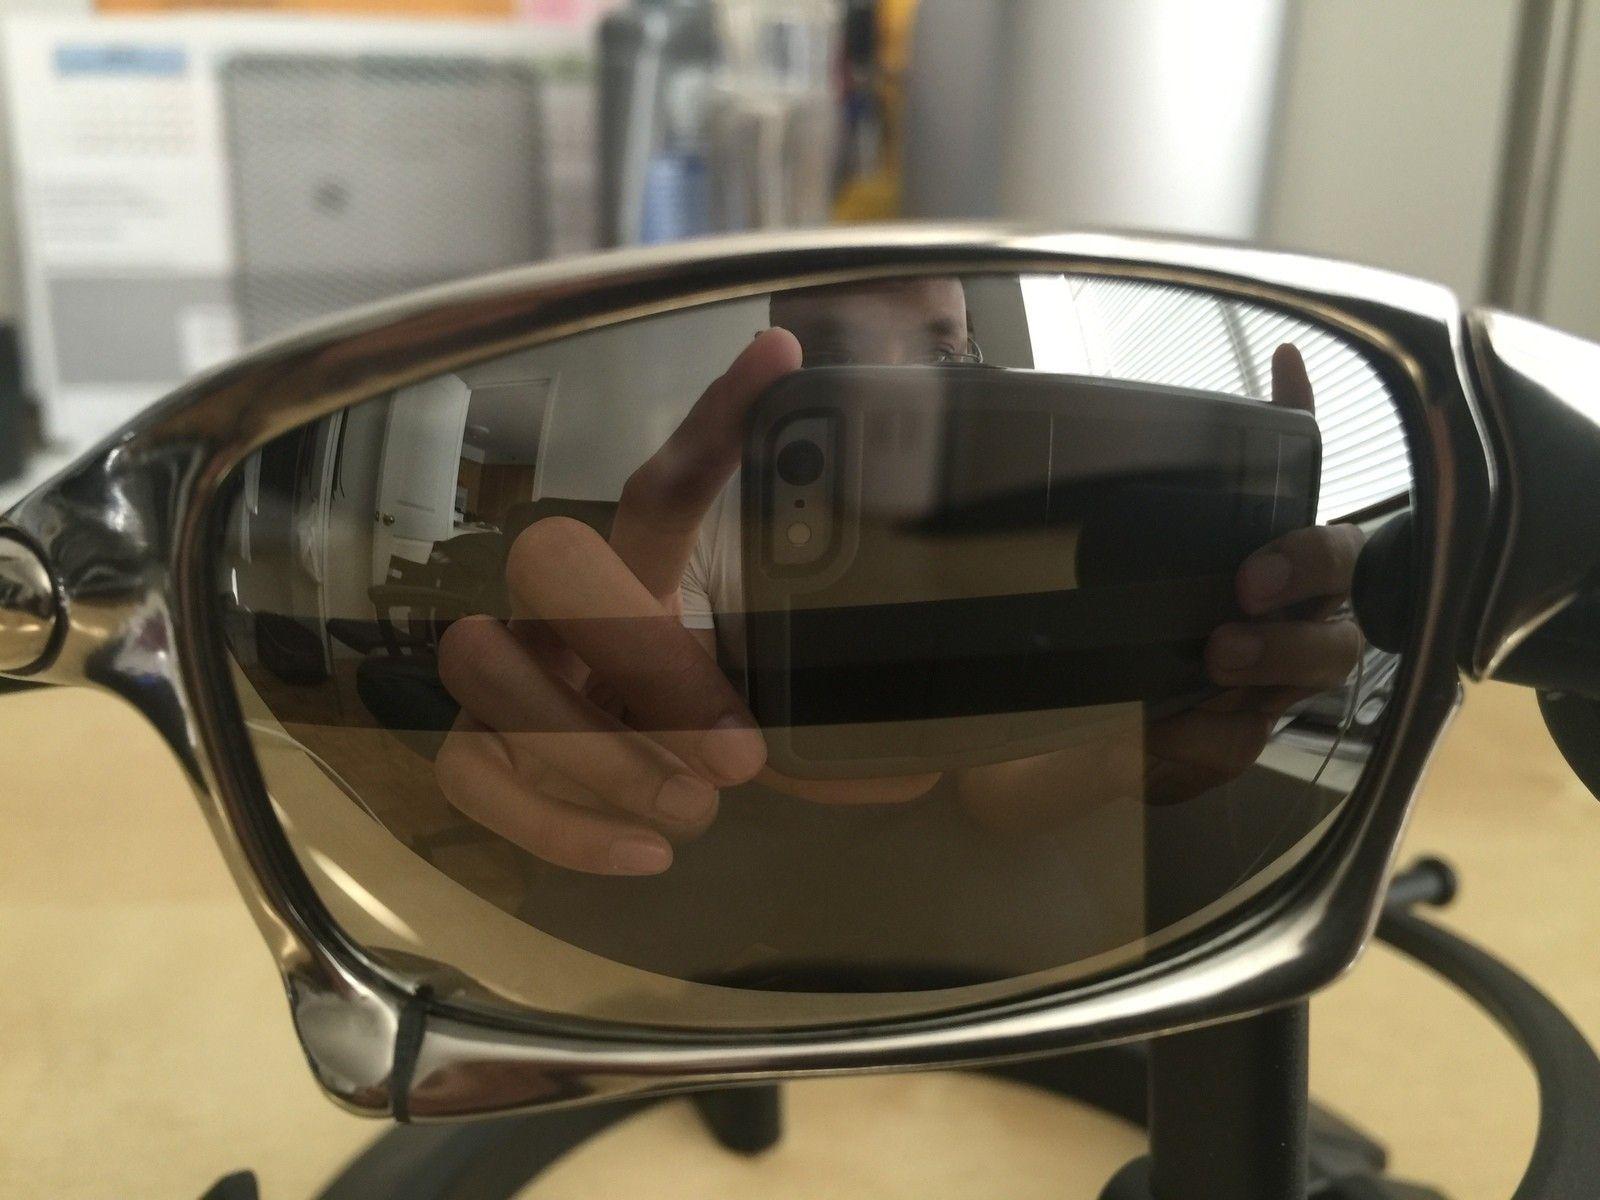 XS Polished with Chrome Polars (mint) with bonus OEM Slate lenses - $550 Shipped - IMG_4929.JPG